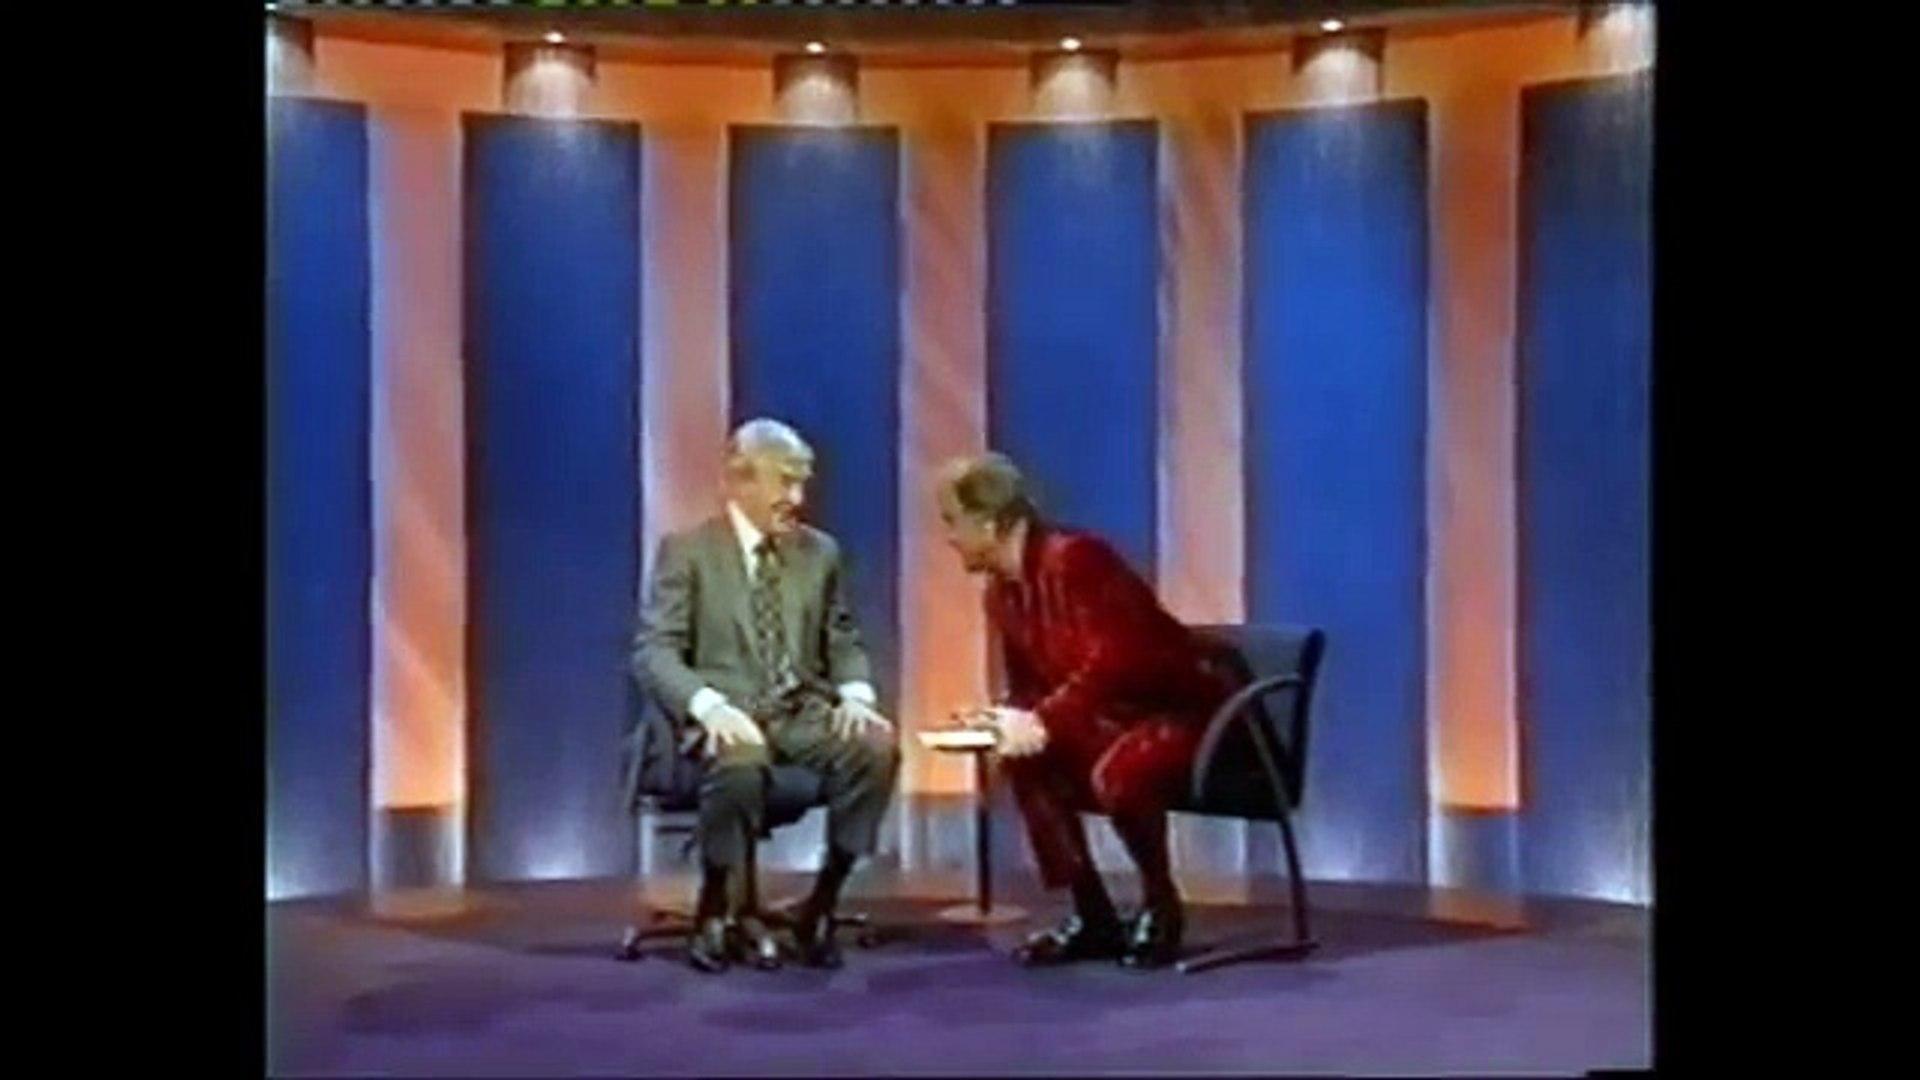 Parkinson Billy Connolly & Sir David Attenborough (1998)